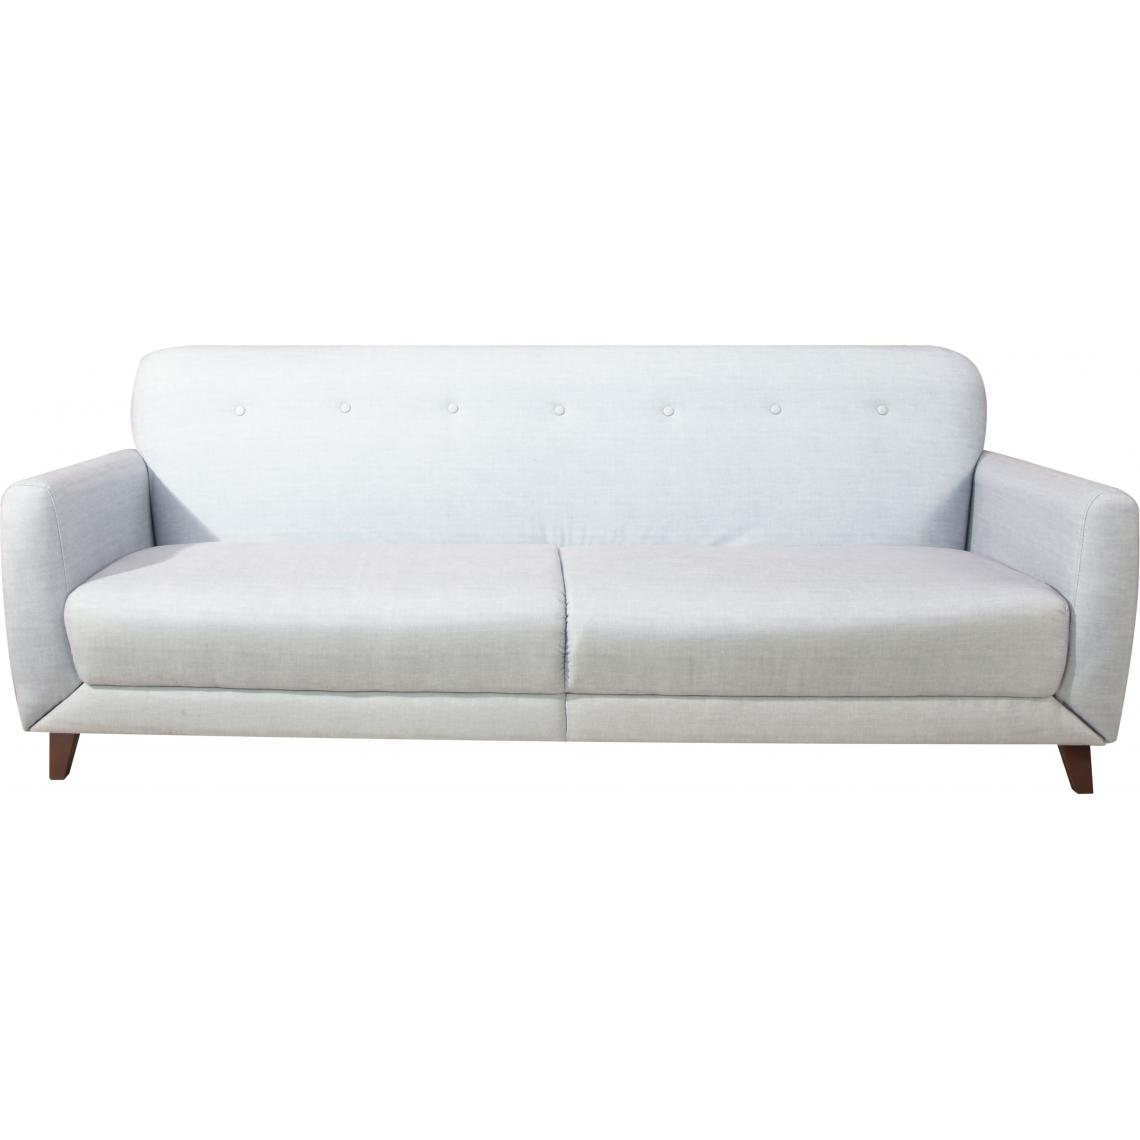 canap convertible clic clac en tissu capitonn lobby 3 suisses. Black Bedroom Furniture Sets. Home Design Ideas